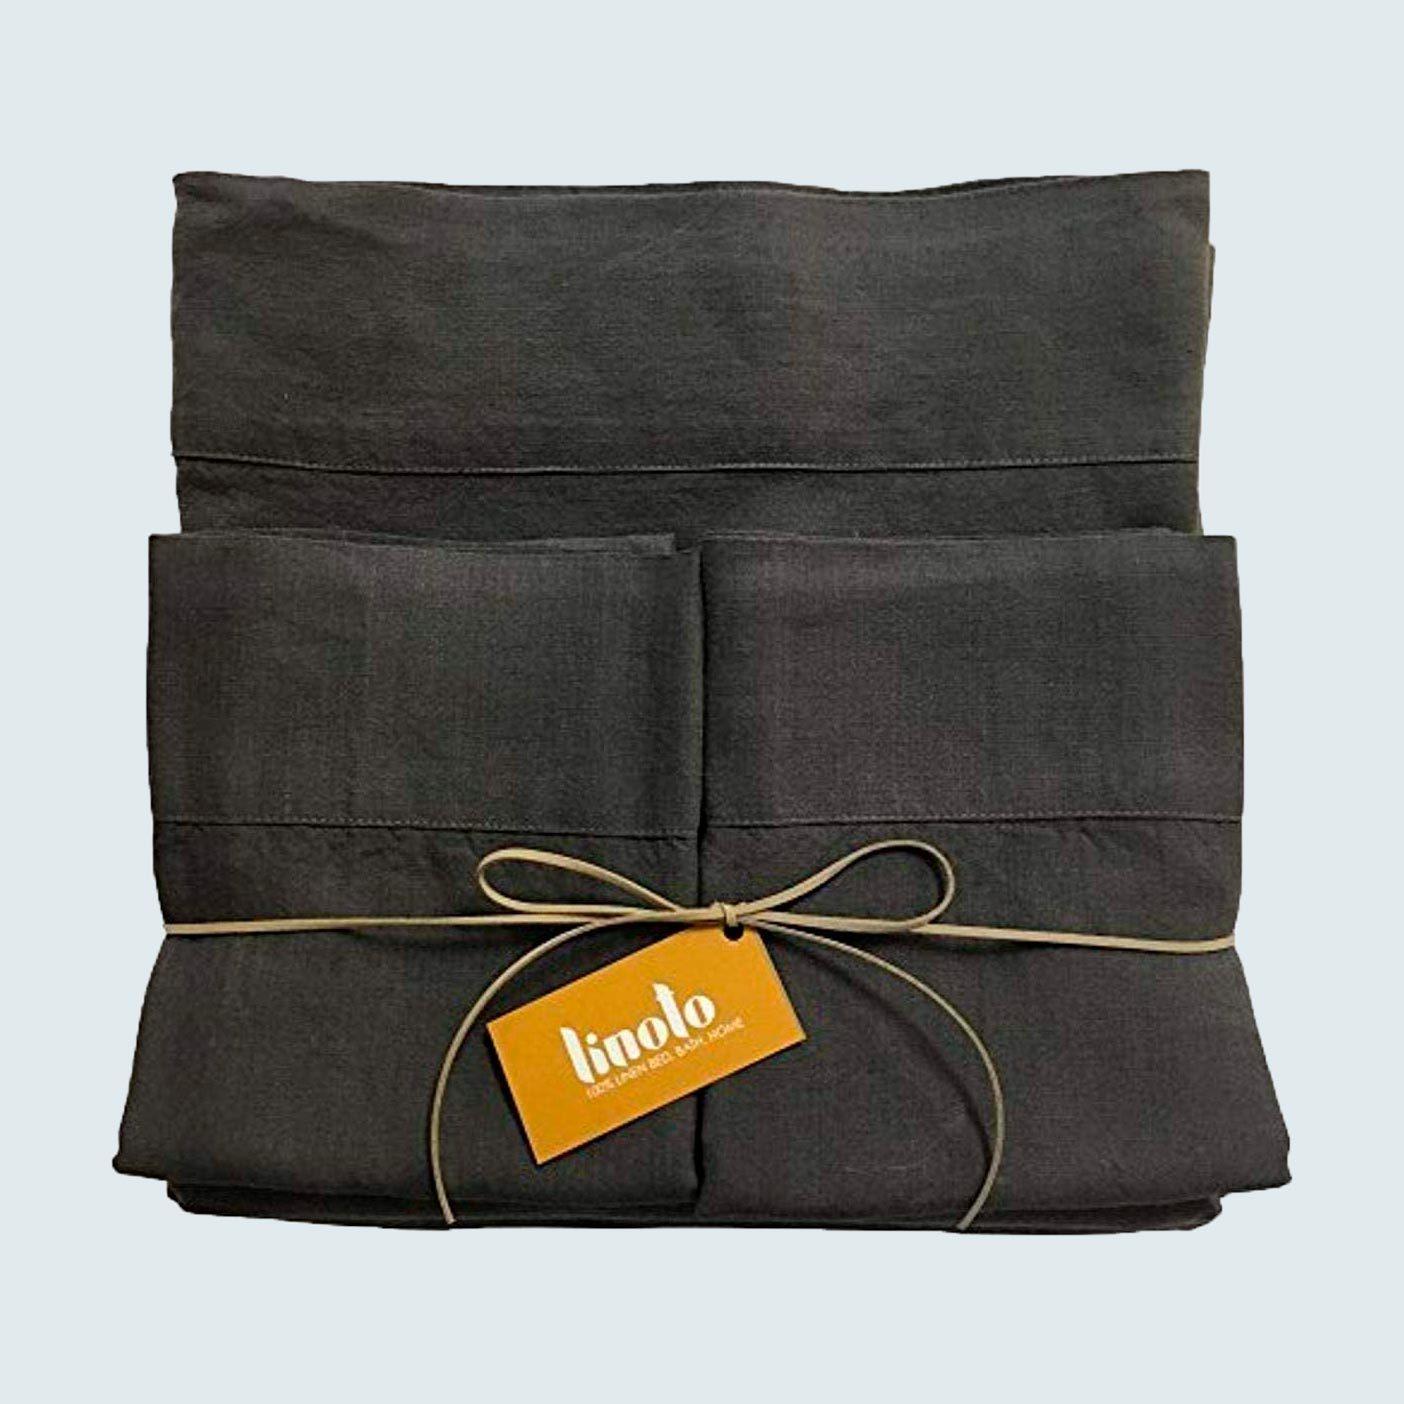 Linoto Pure Belgian Italian Flax Linen Bed Sheet Set